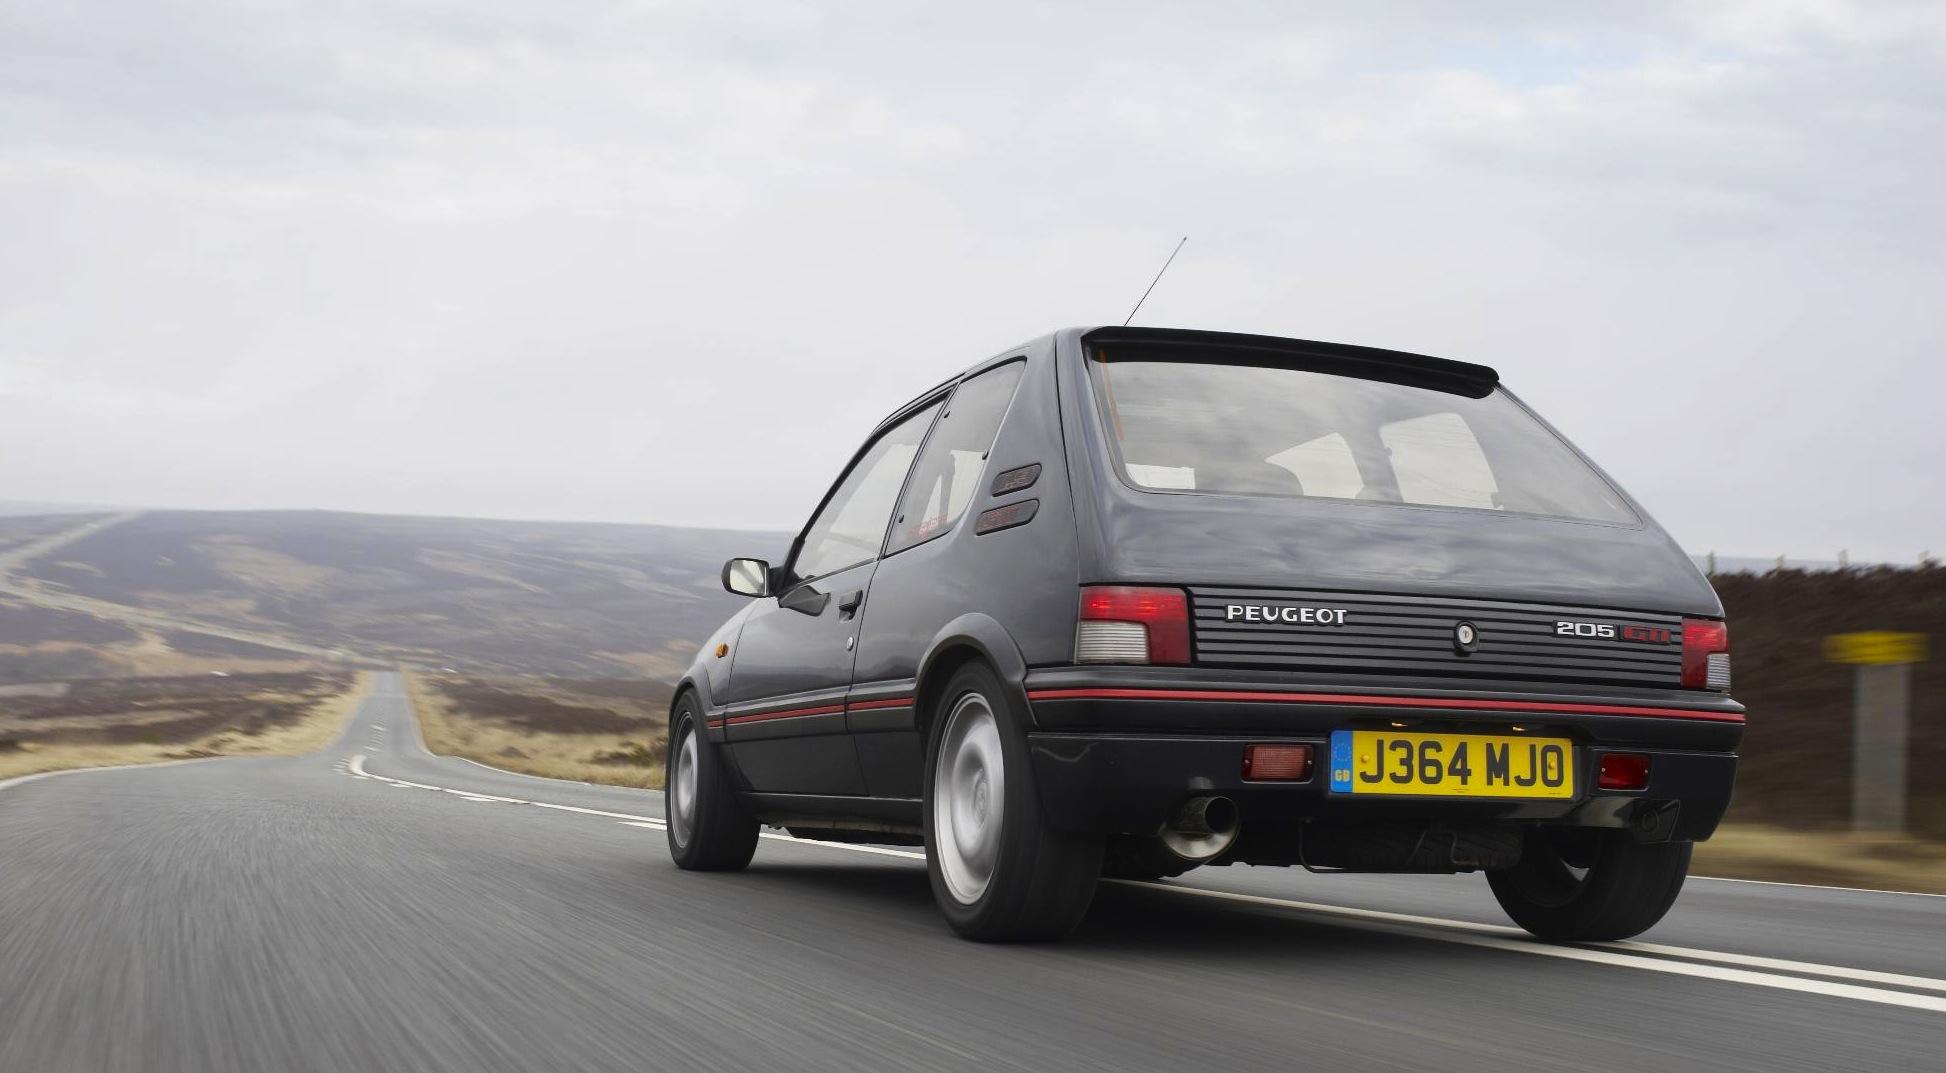 Peugeot 208 Gti Will Resurrect Spirit Of 205 Gti Says Car